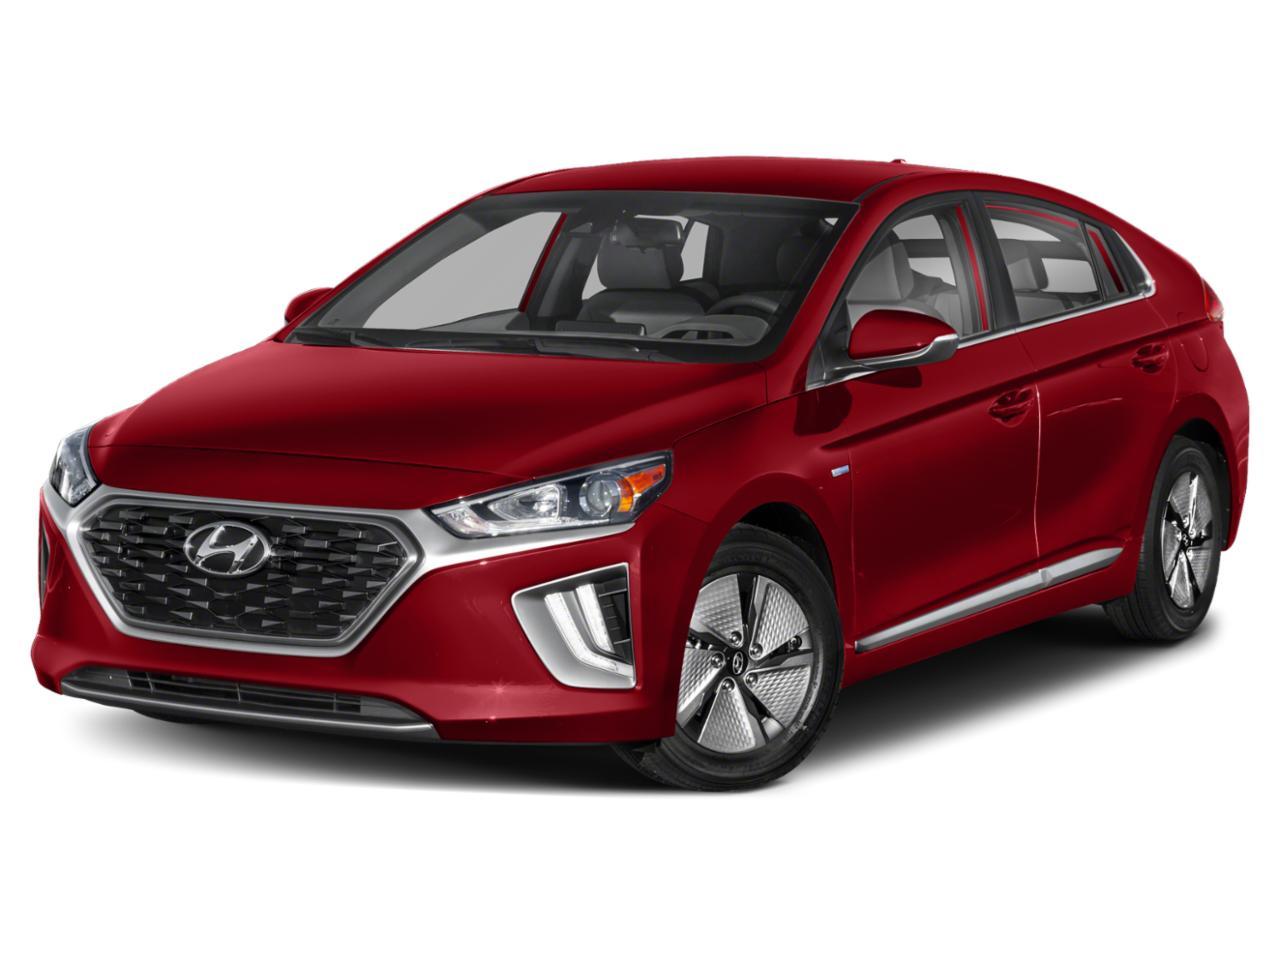 2022 Hyundai IONIQ Hybrid Vehicle Photo in Odessa, TX 79762